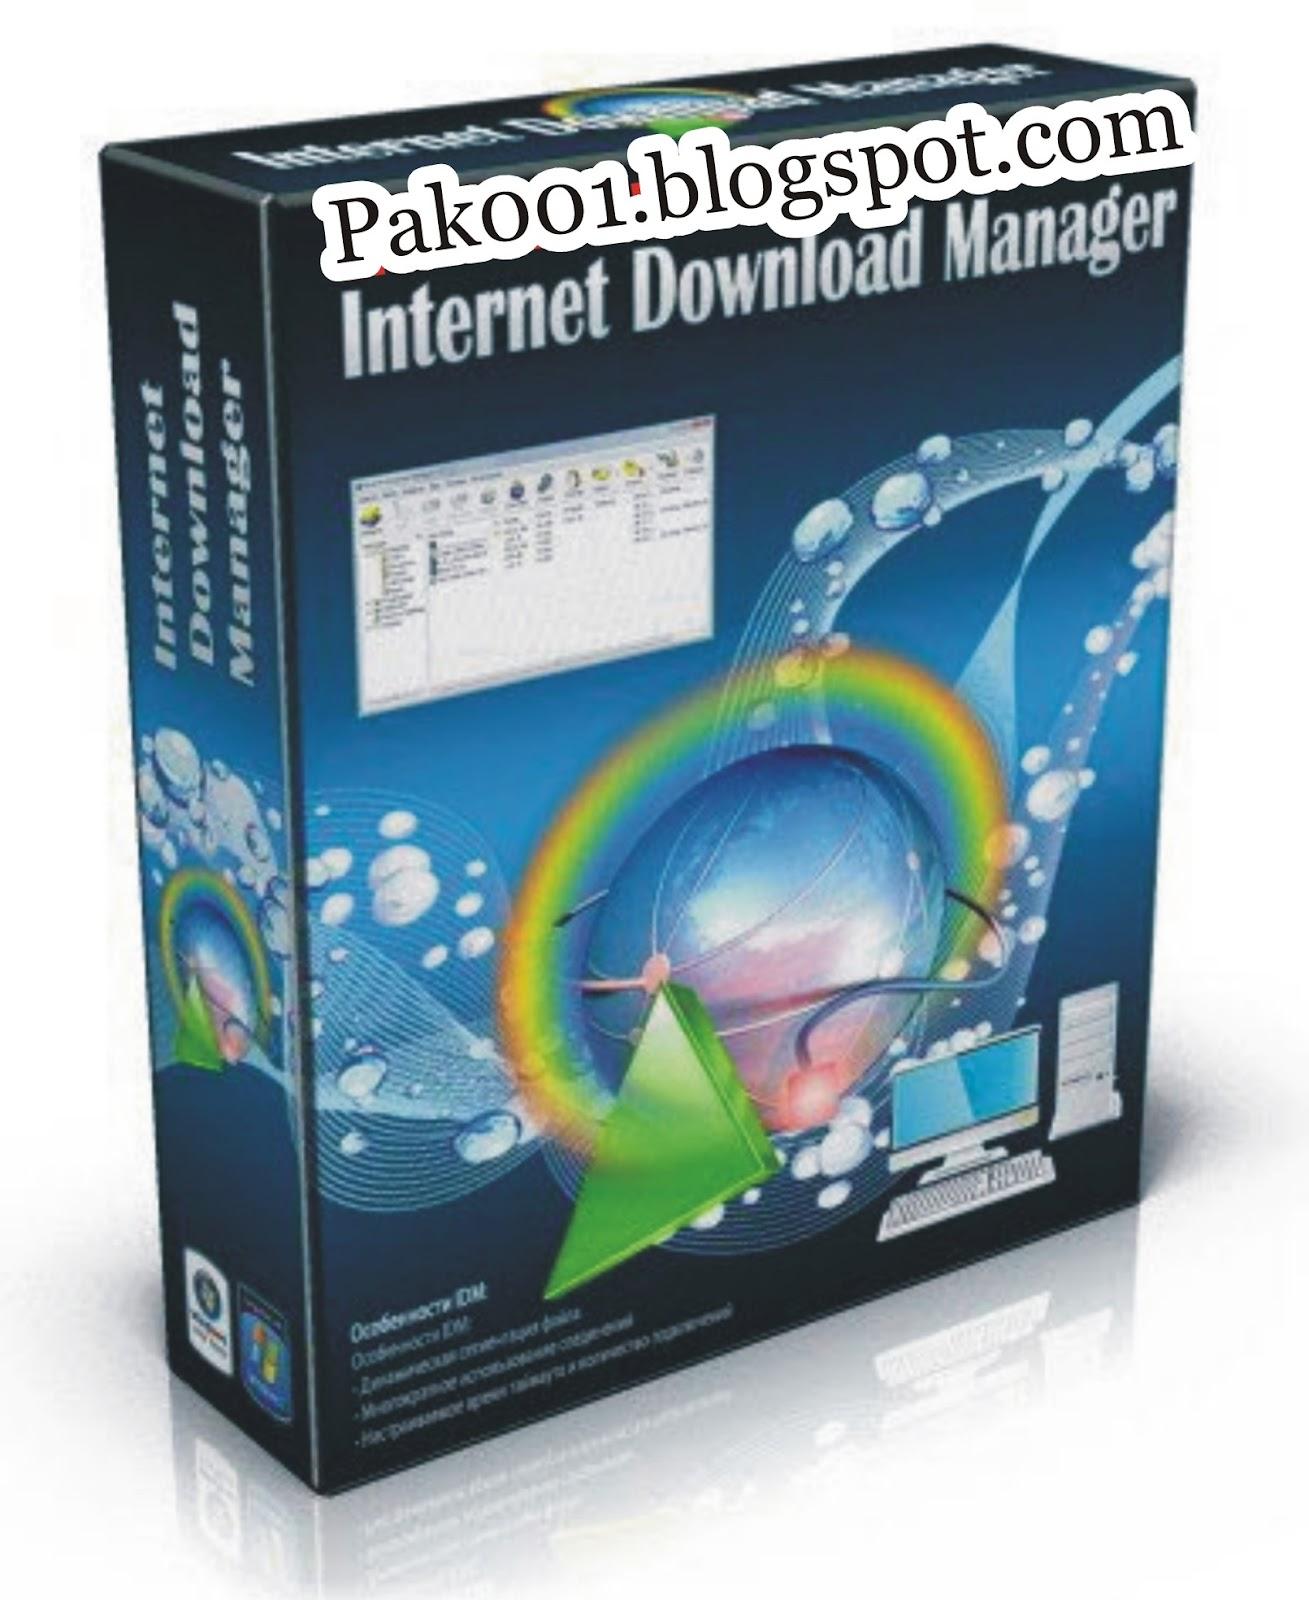 download register idm 5.19 free